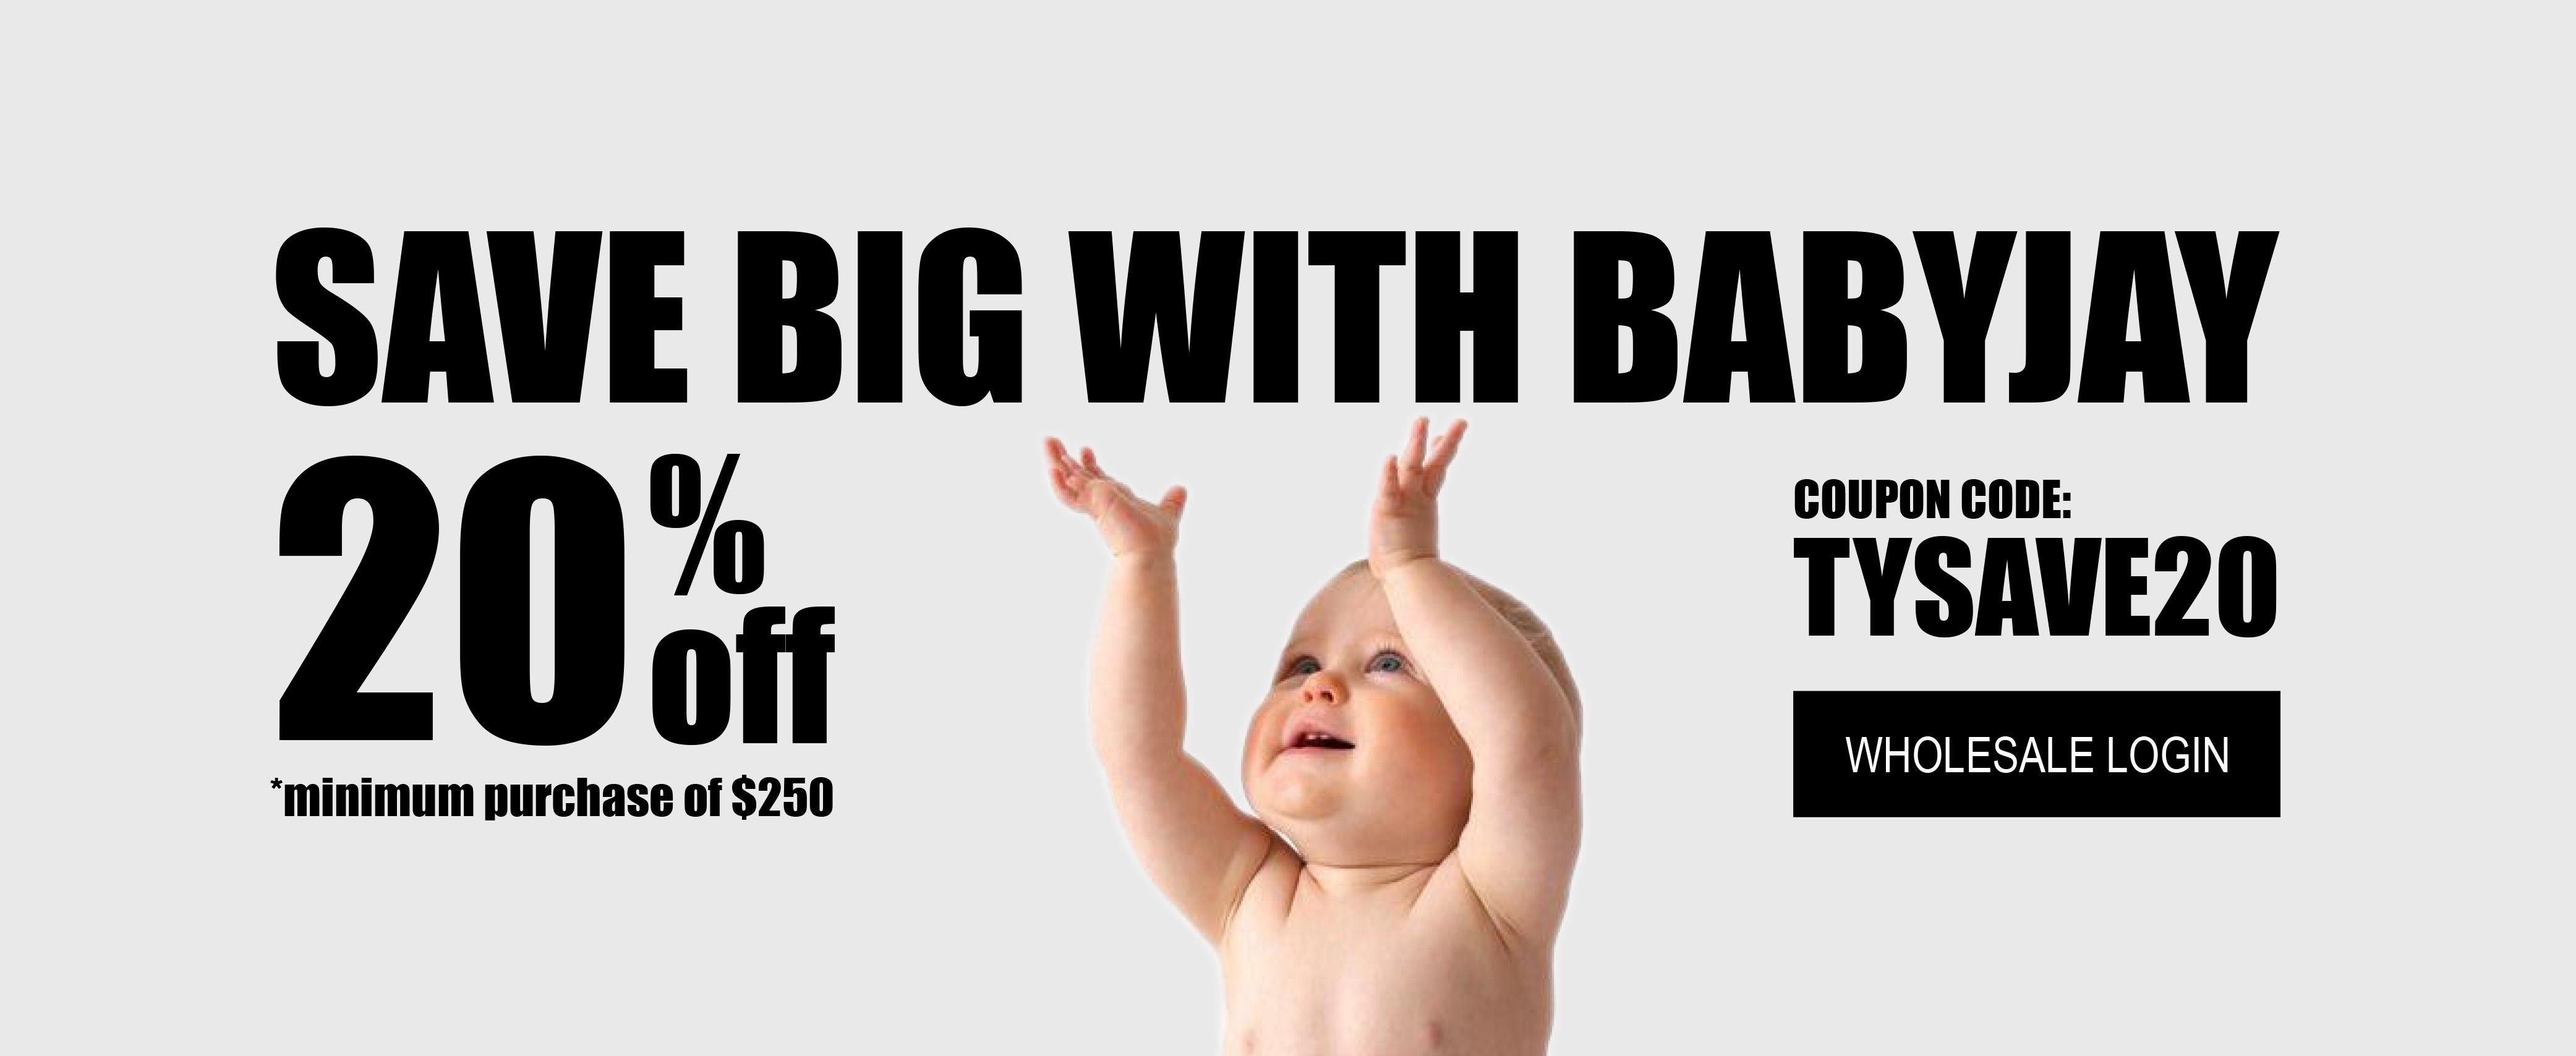 cheap baby onesies, bulk sale, bulk baby items, sale, baby jay, babyjay